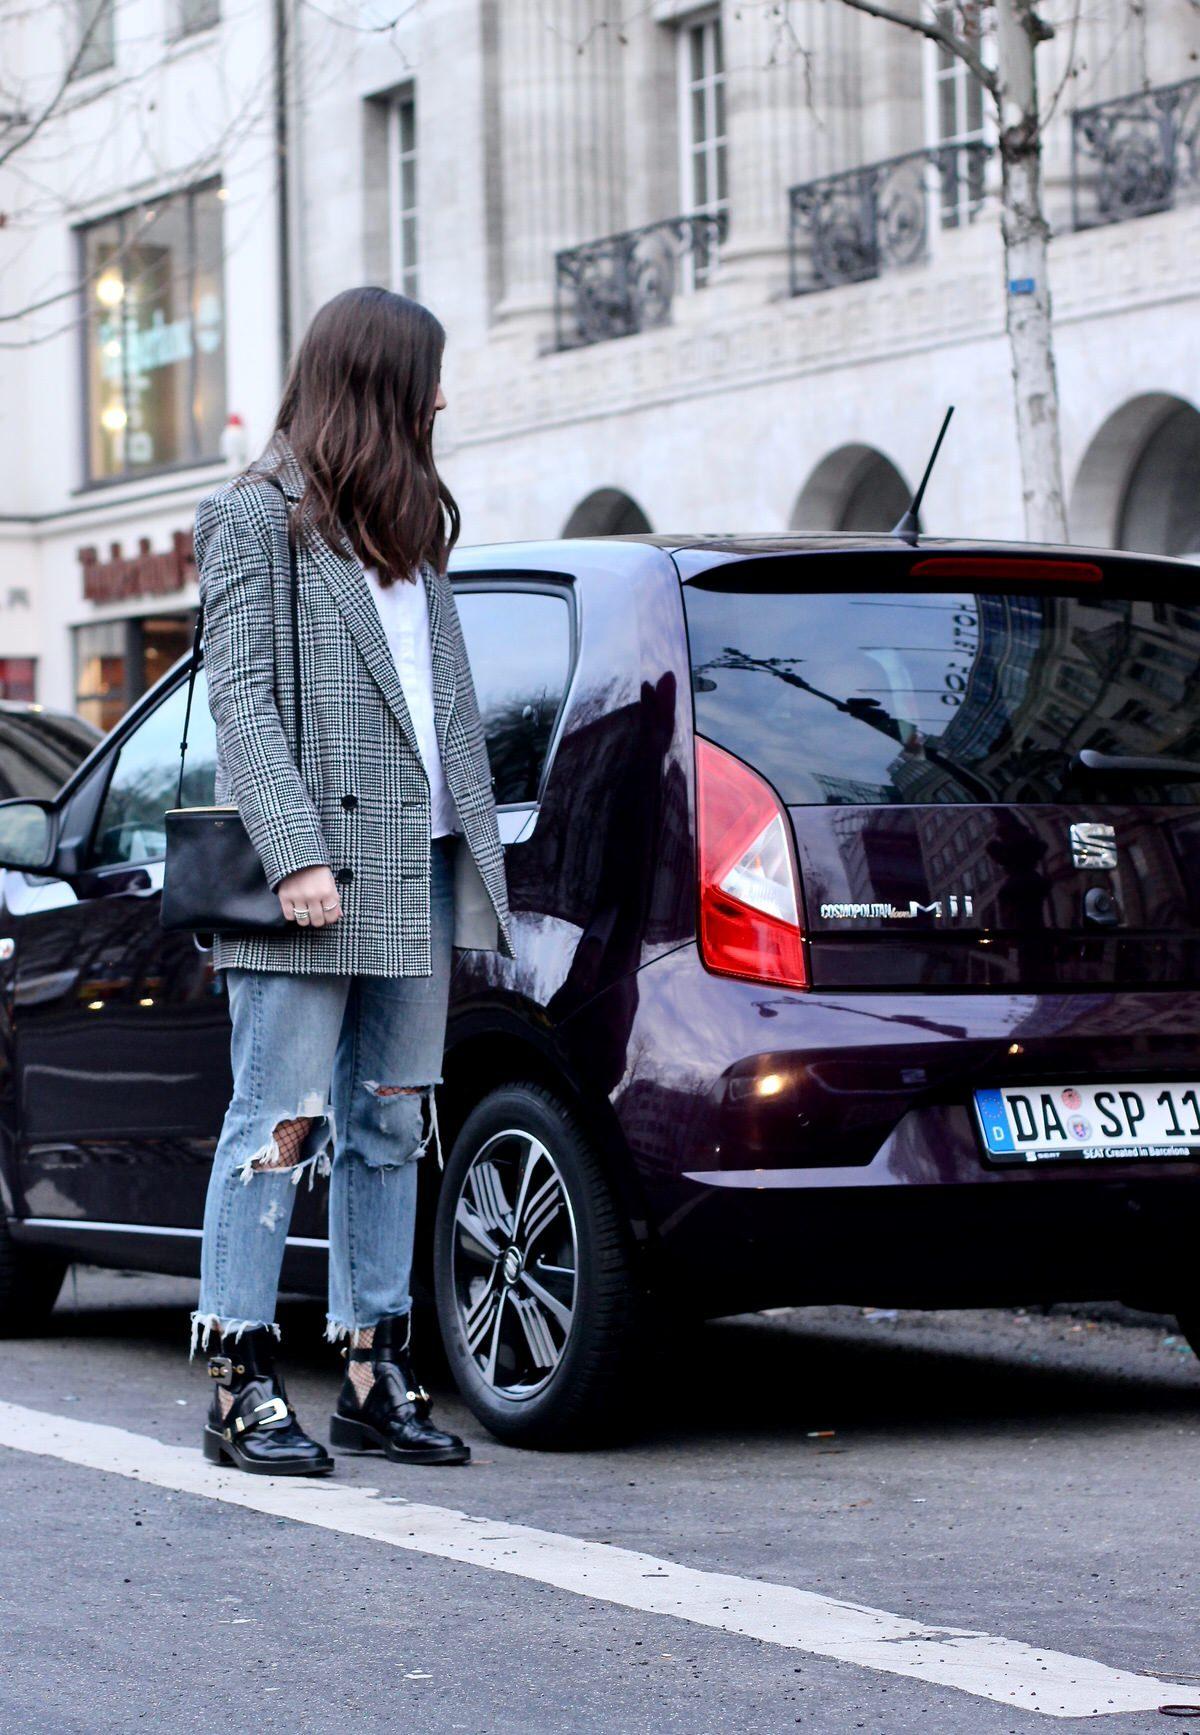 SEAT, ThisIsMii, Cosmopolitan, rS, reward style, Marcel Ostertag, Berlin, Mii, Fashion Week, Show,